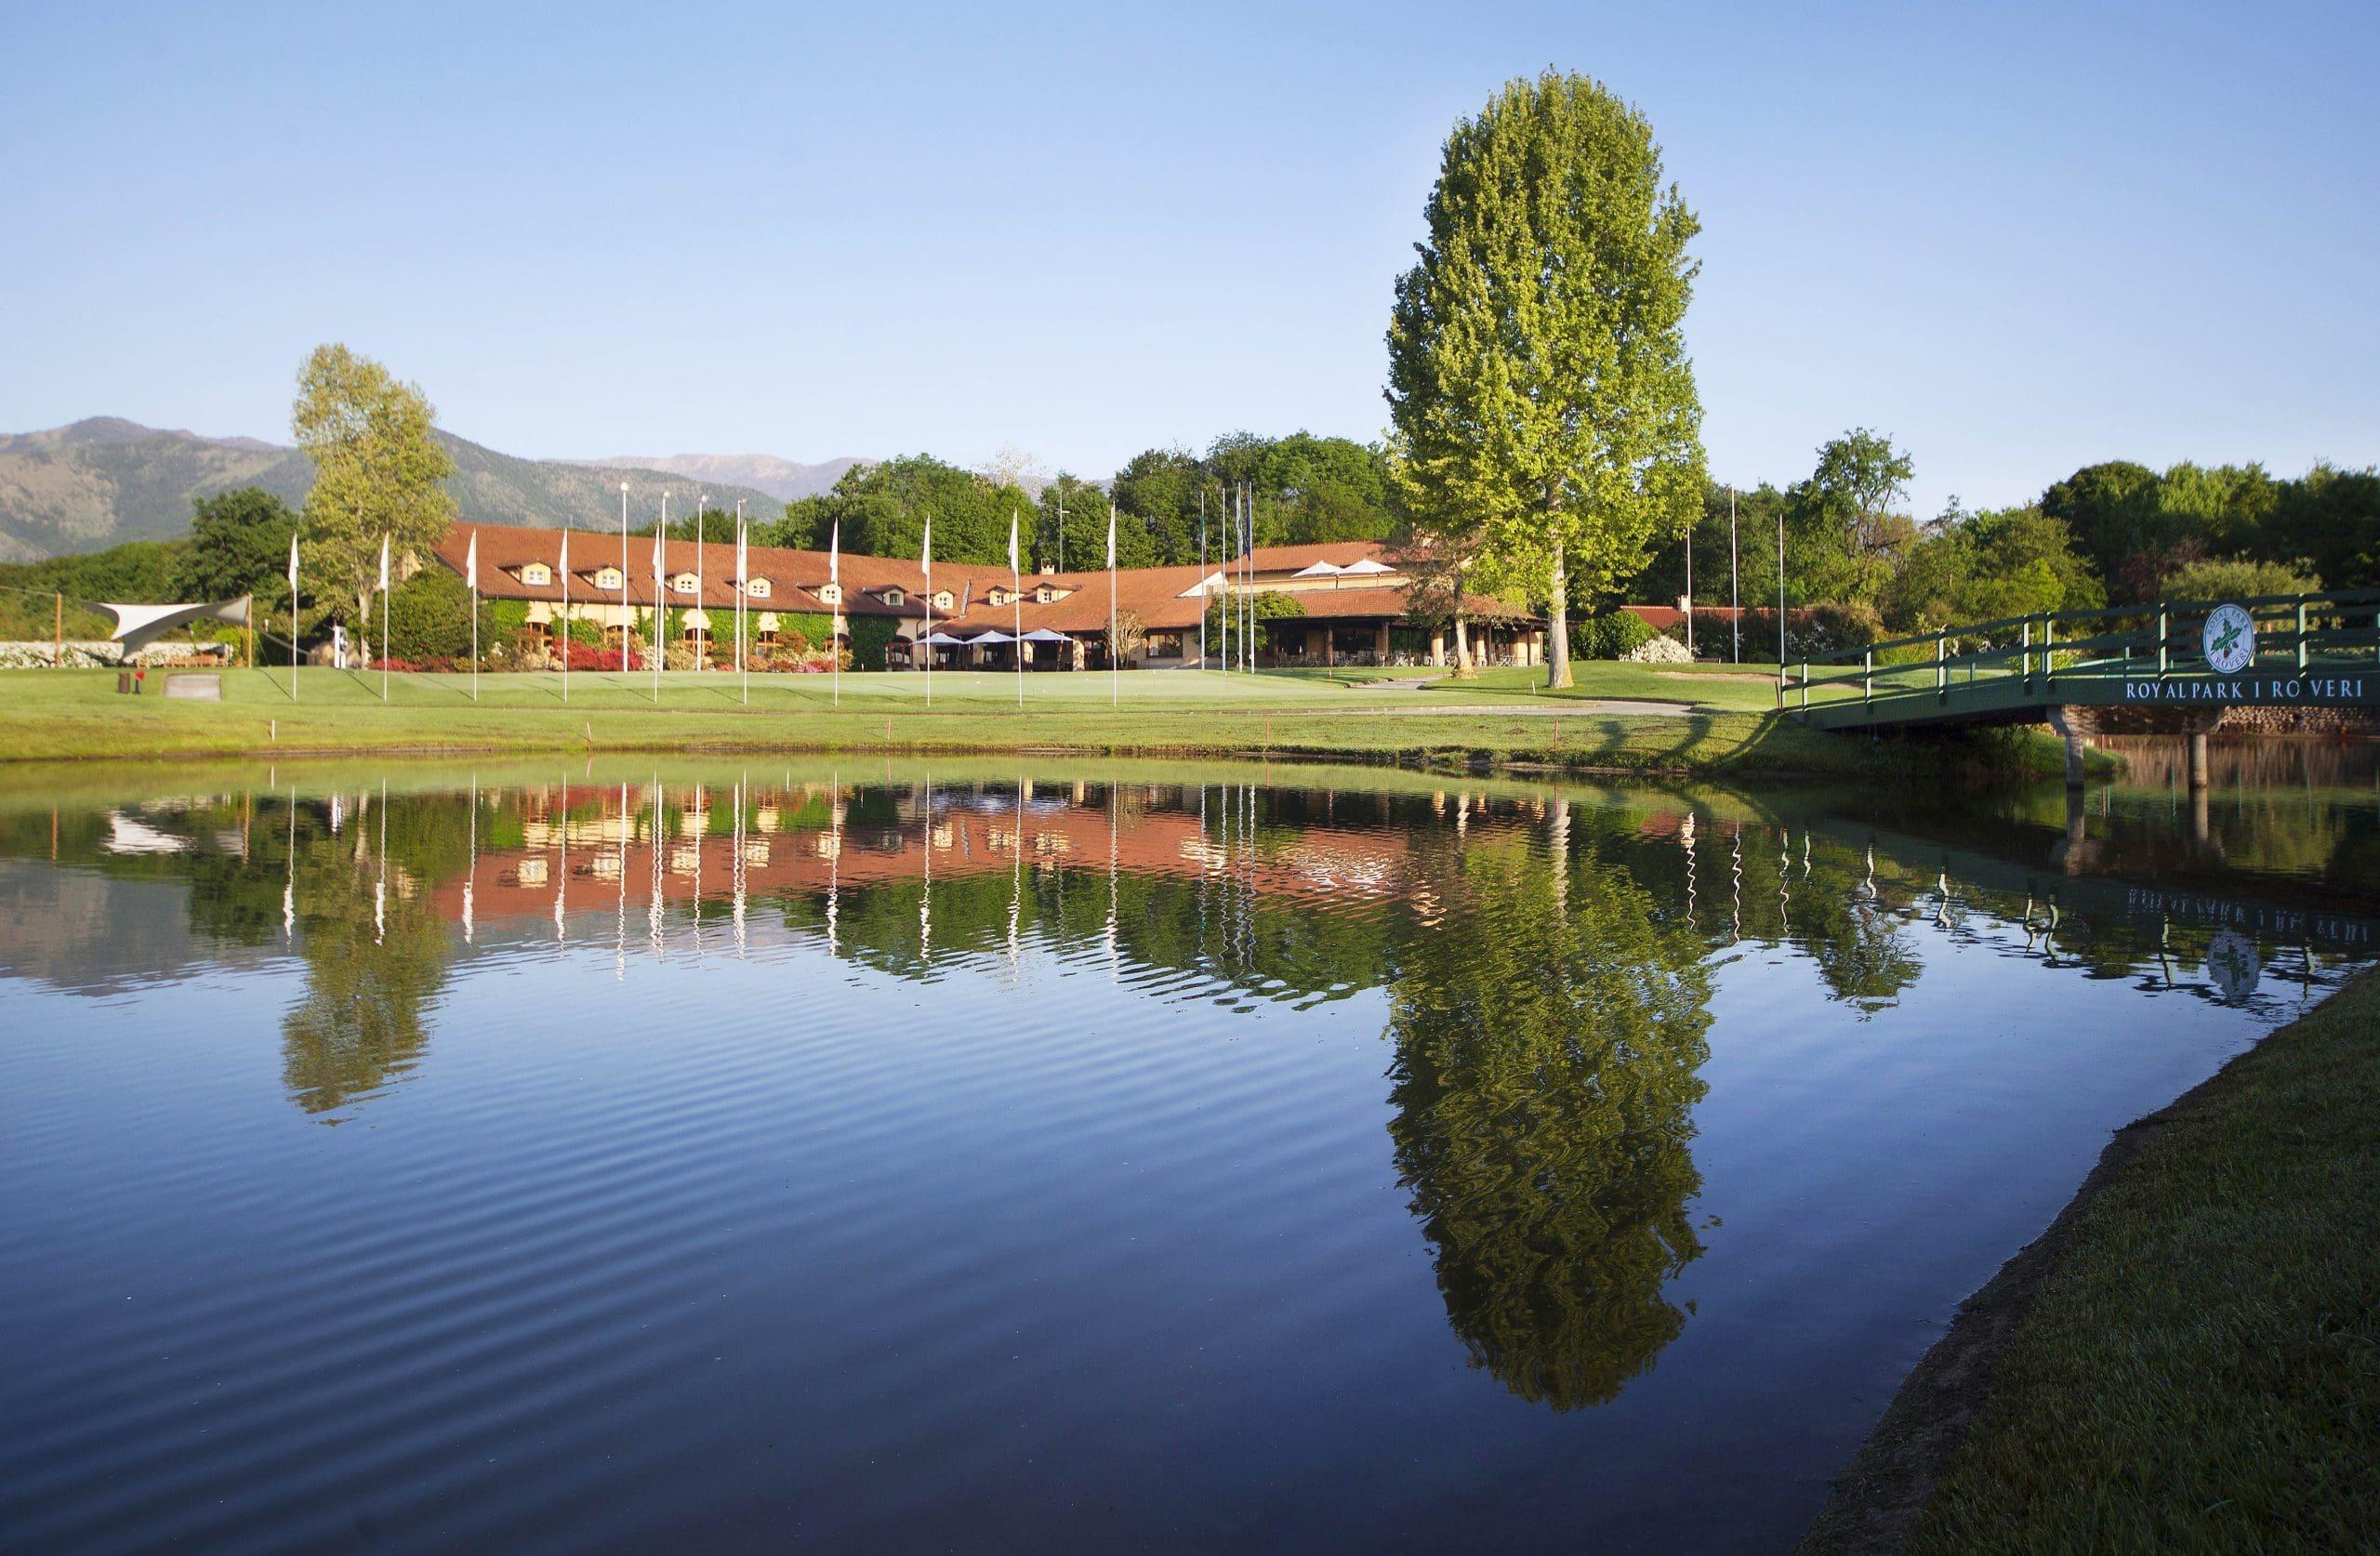 Royal-Park-I-Roveri-Club-House-1